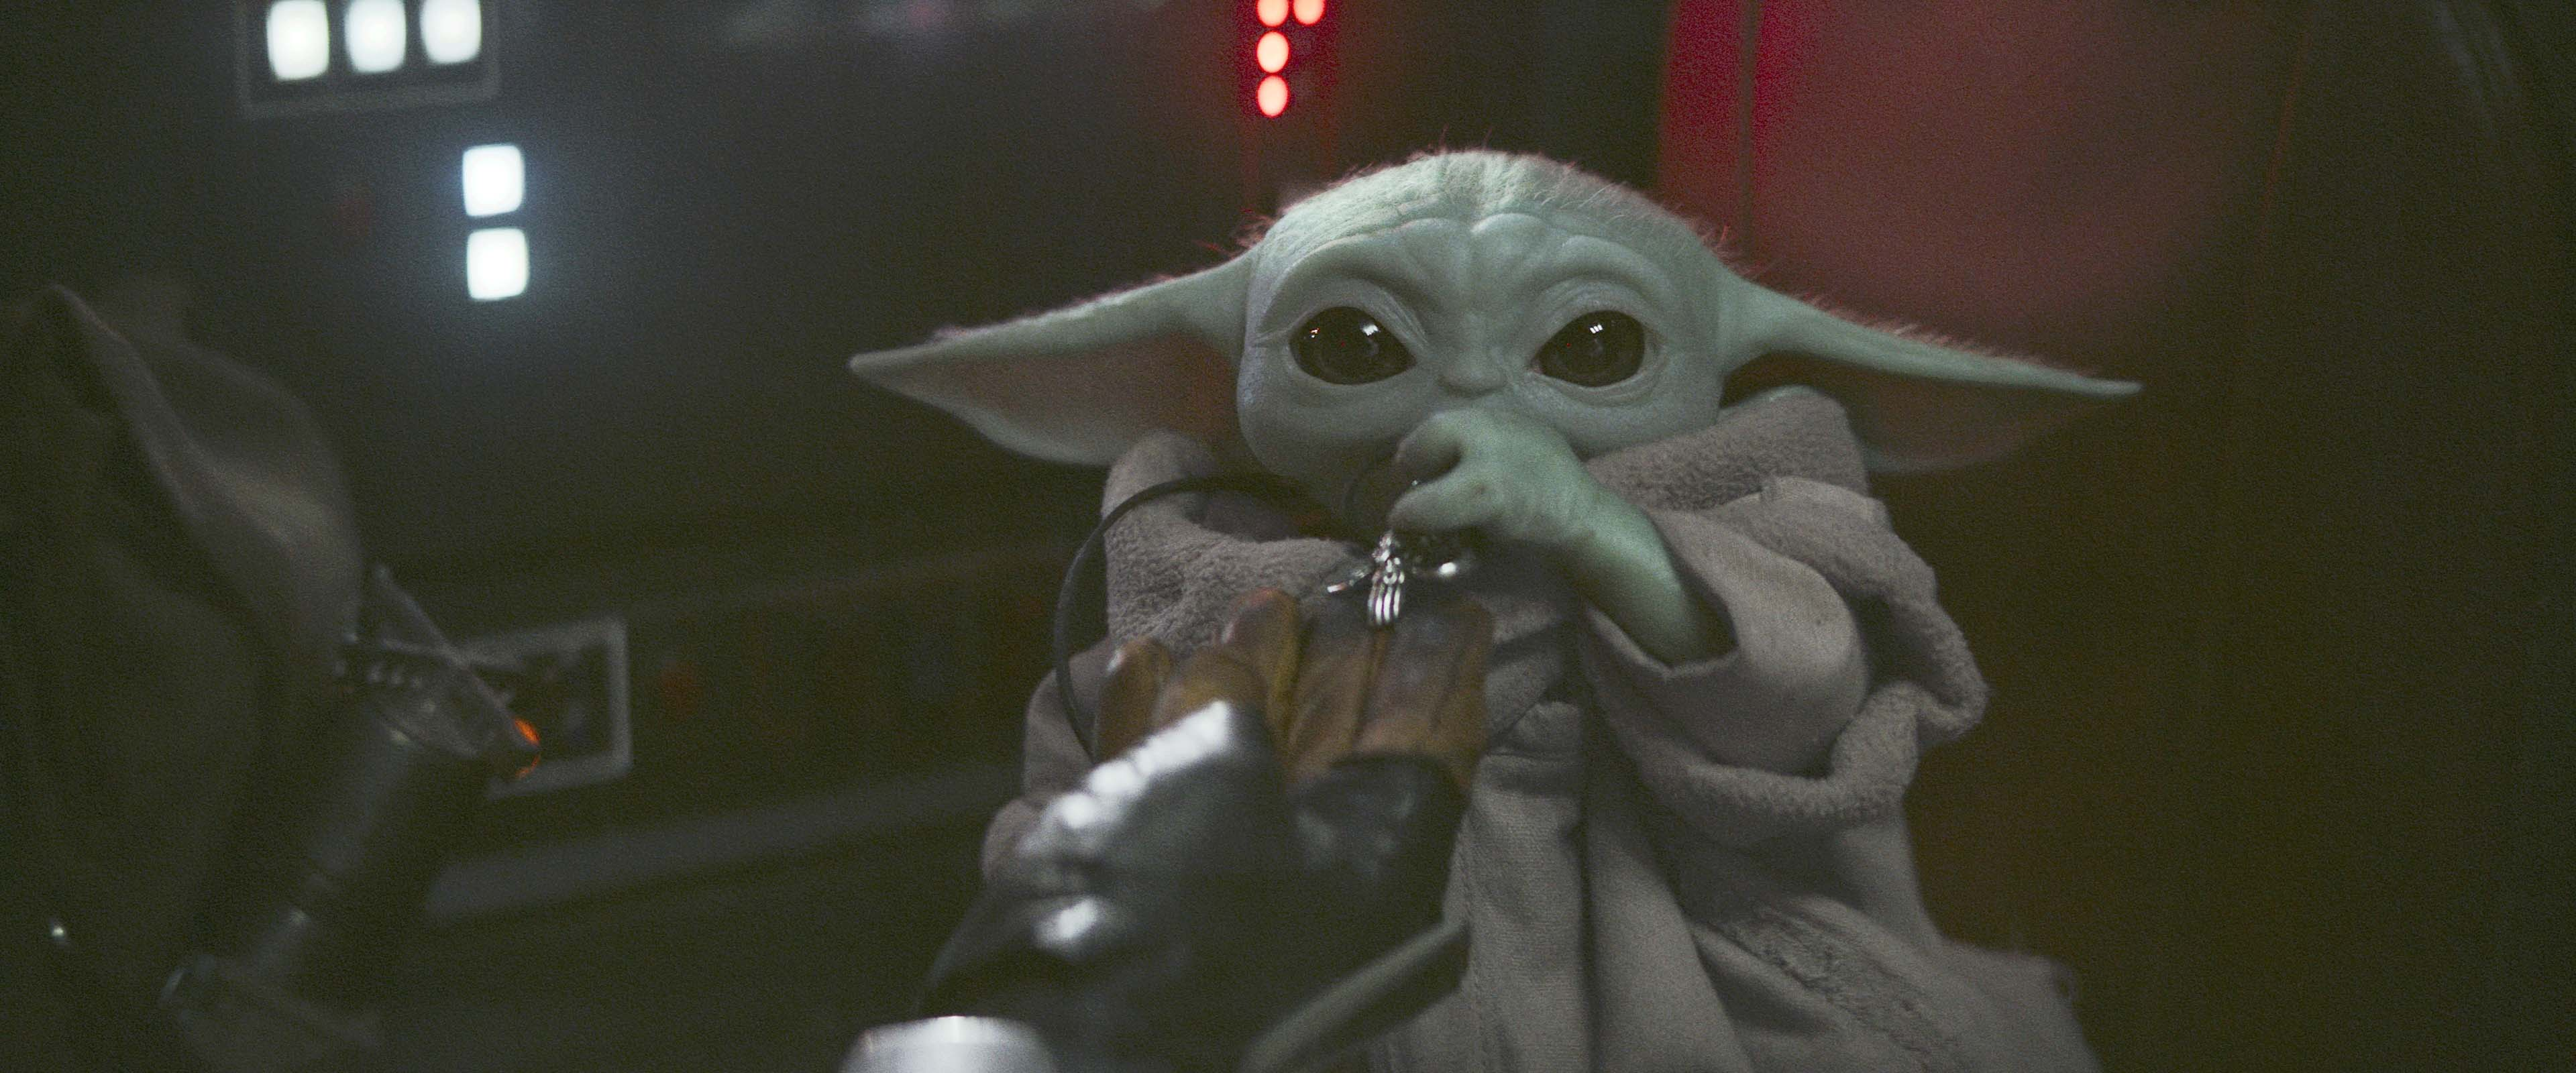 Golden Globes Baby Yoda Is Not Yoda Says Mandalorian Creator